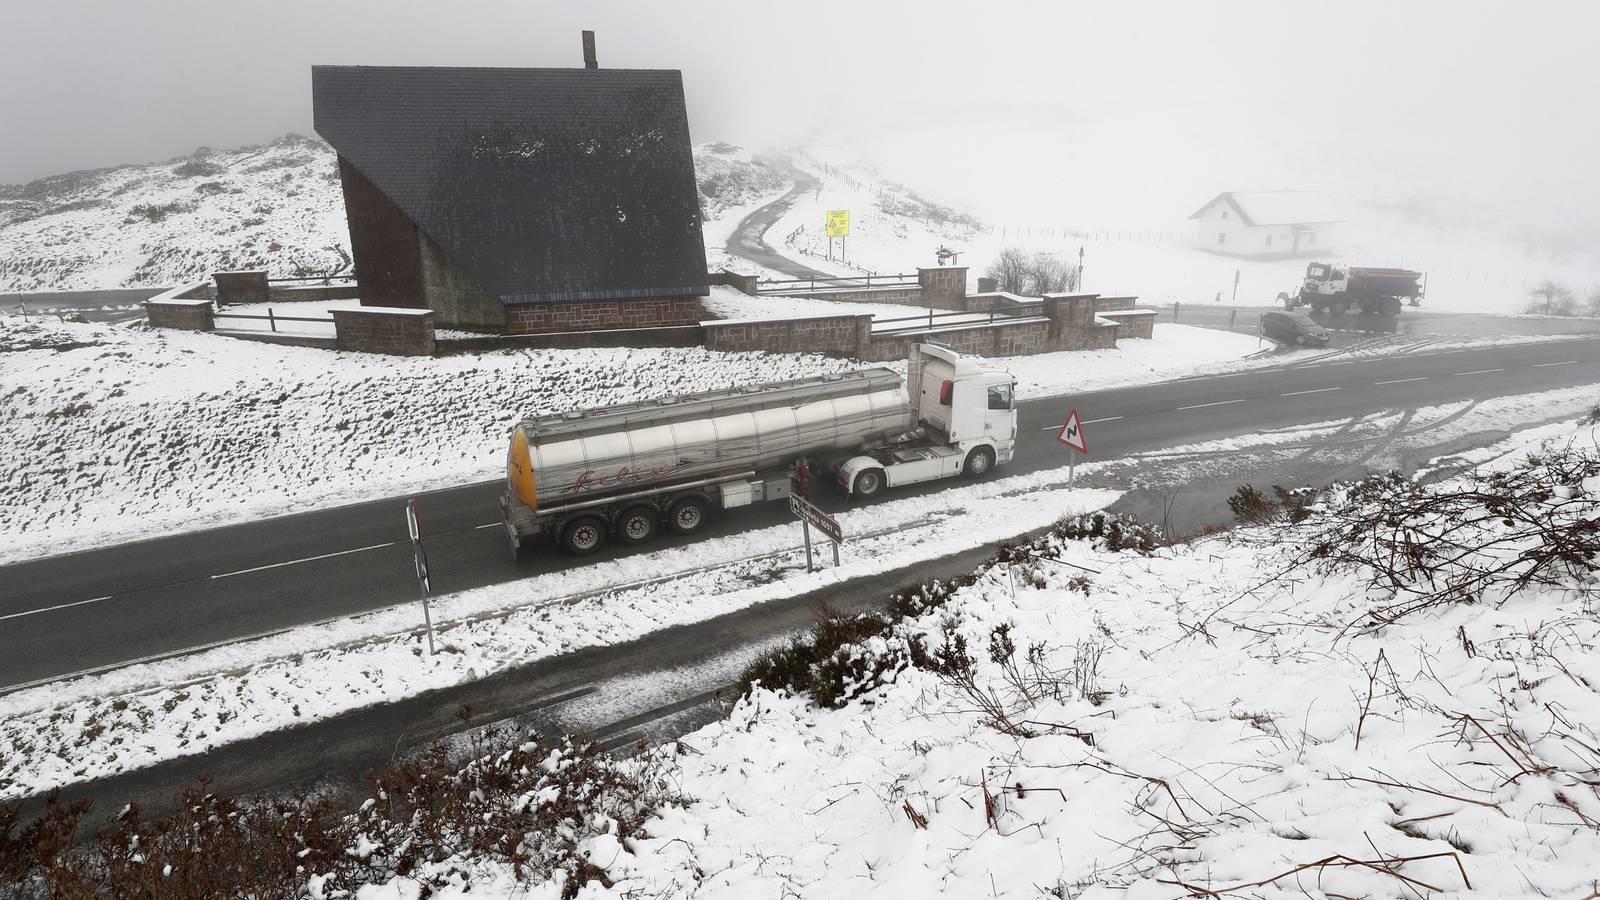 Documentan récord de frío de -69.6 grados en Groenlandia